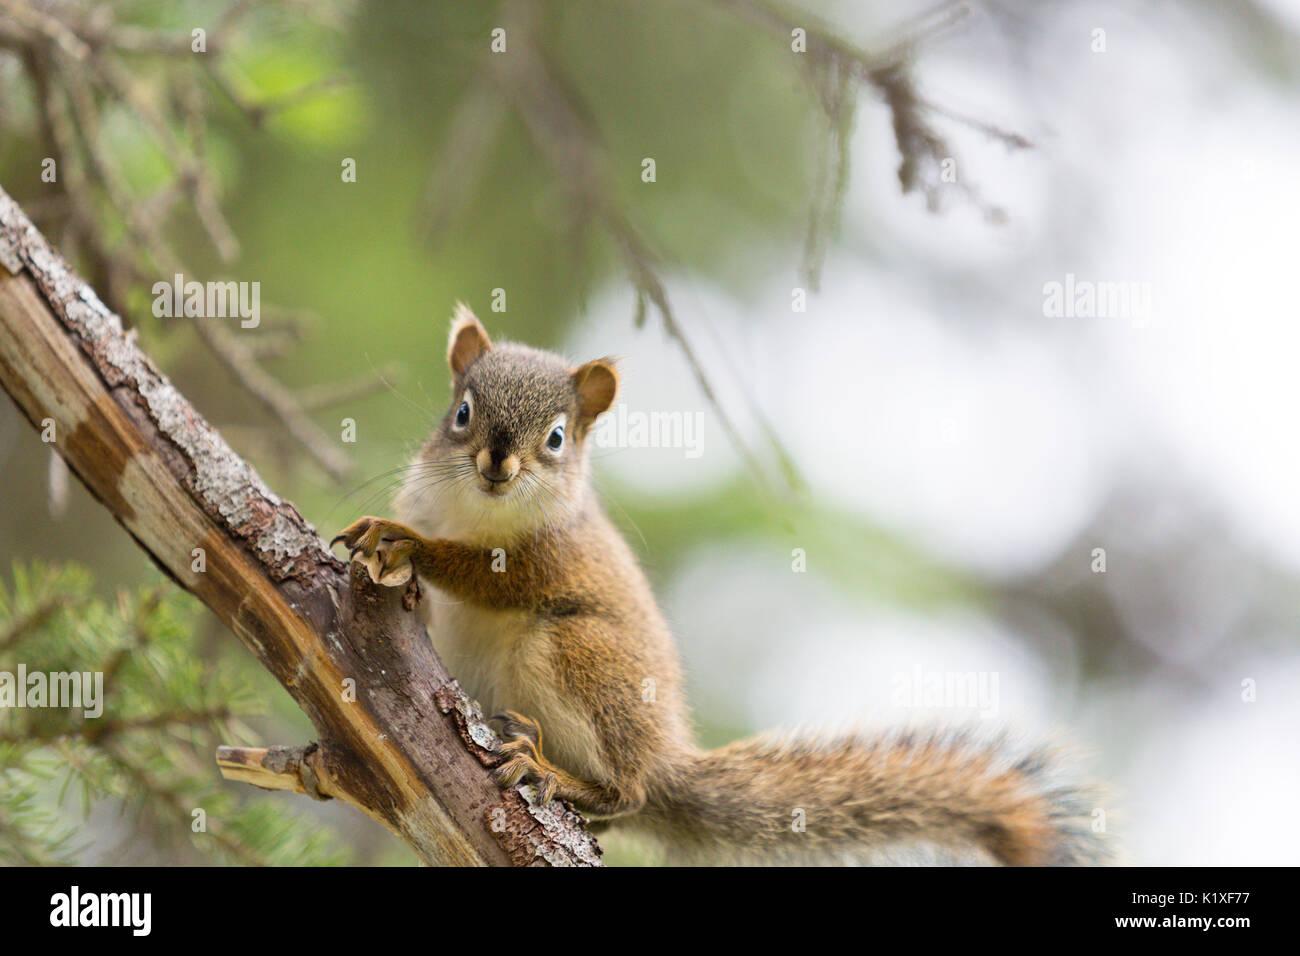 American Red Sqirrel, Tamiasciurus hudsonicus, Eagle River, Anchorage, Alaska, USA Photo Stock